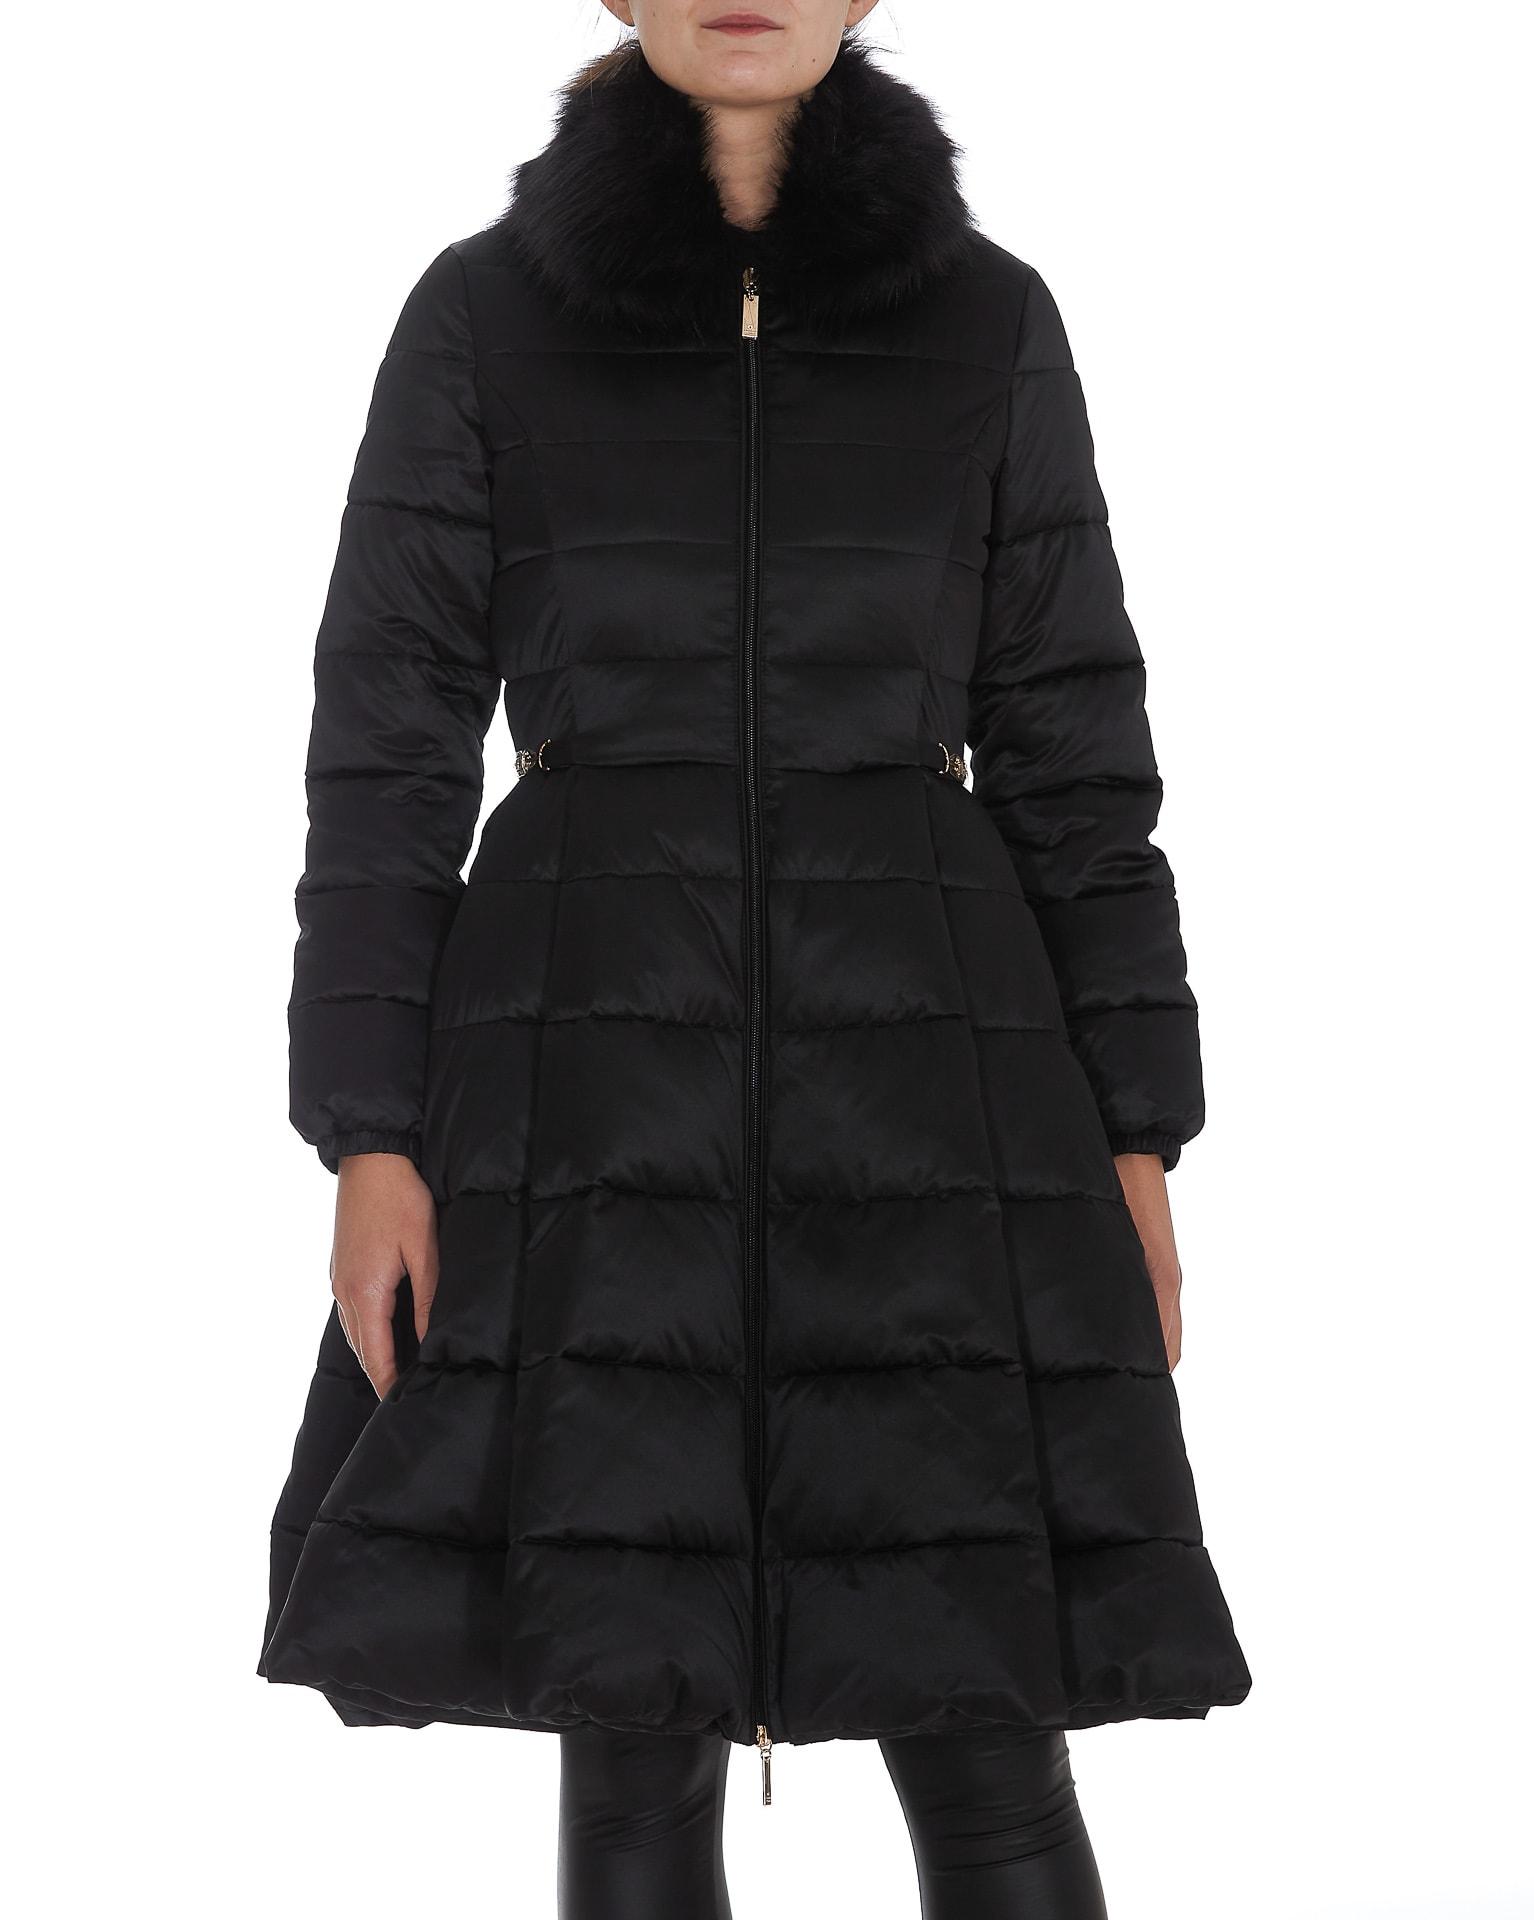 Elisabetta Franchi Jacket In Black